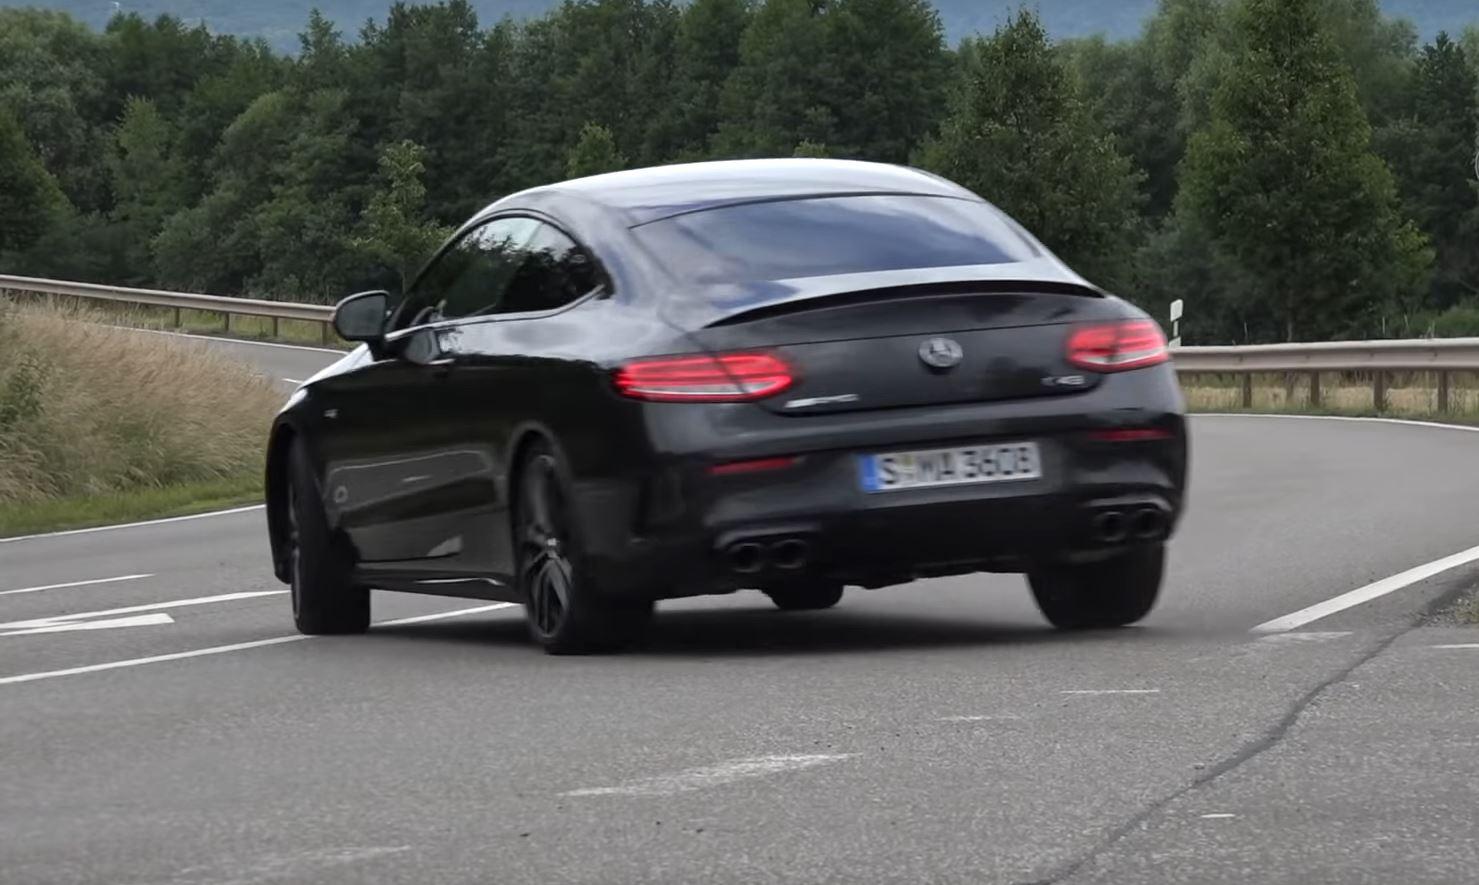 390 HP 2019 Mercedes-AMG C43 Hits 100 KM/H in 4 5 Seconds